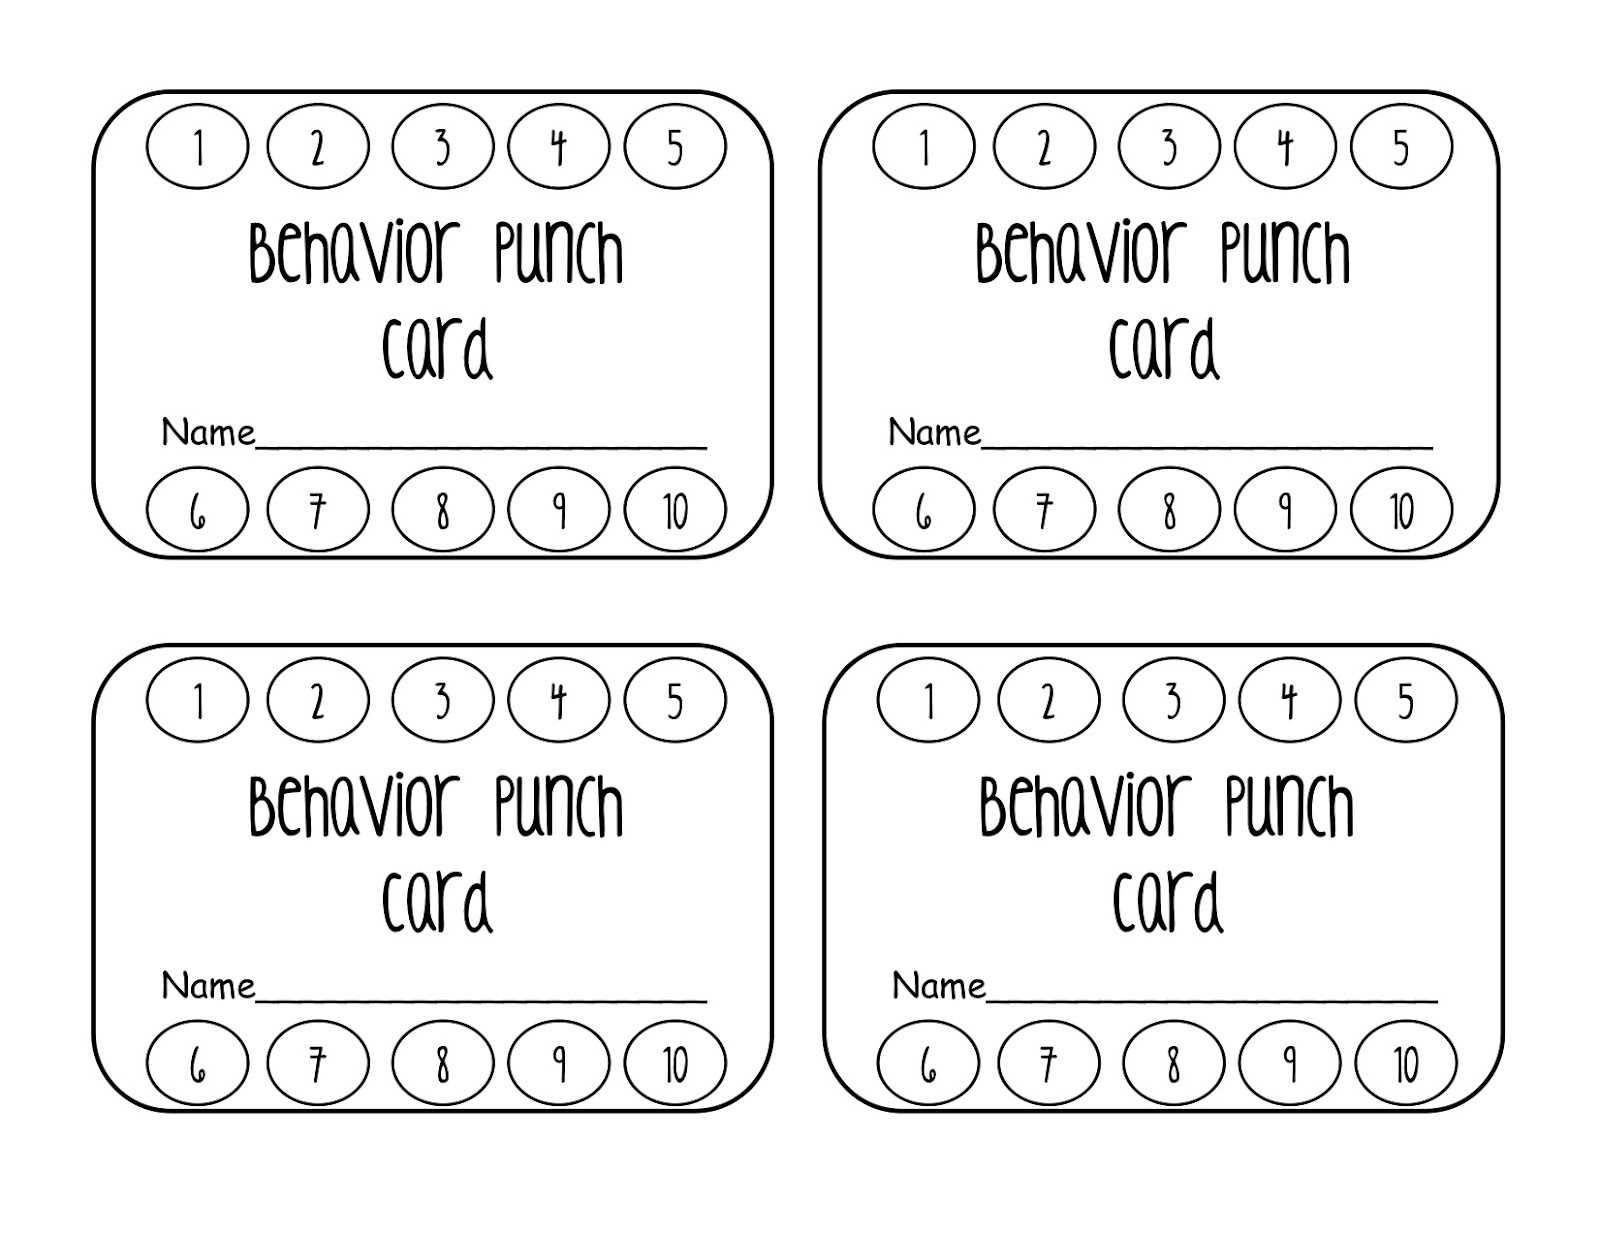 Reward Punch Card Template - Calep.midnightpig.co Regarding Free Printable Punch Card Template